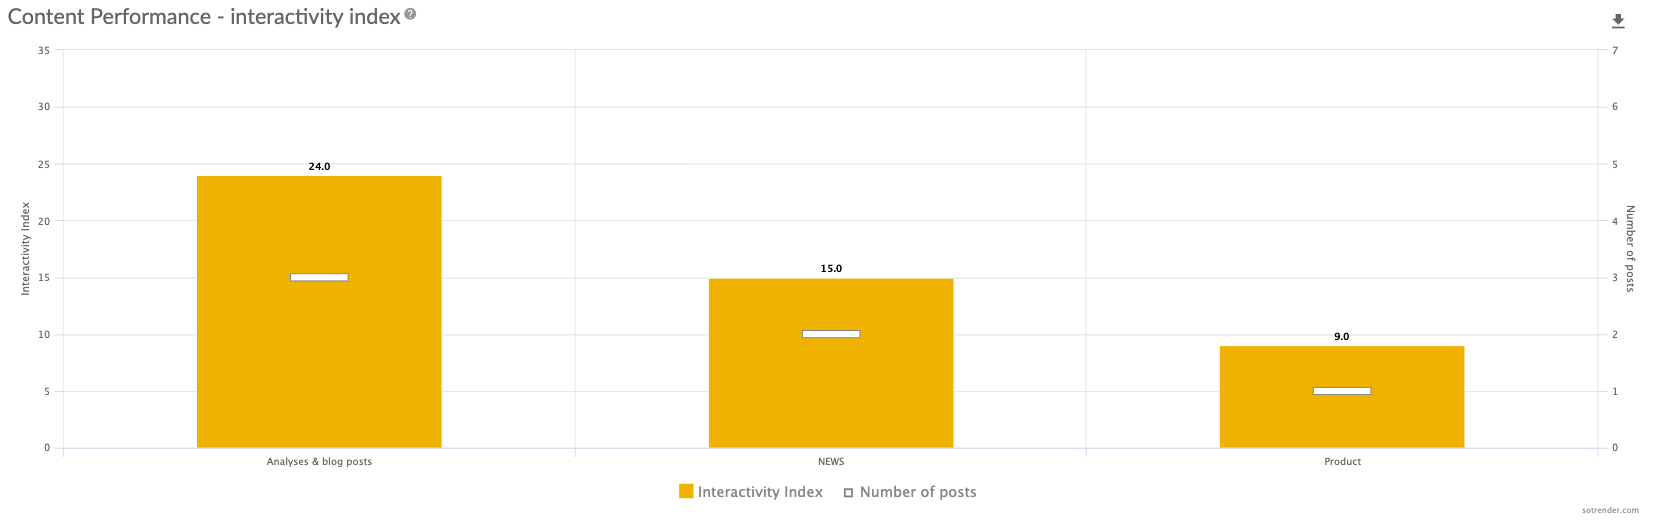 Content performance - Interactivity Index